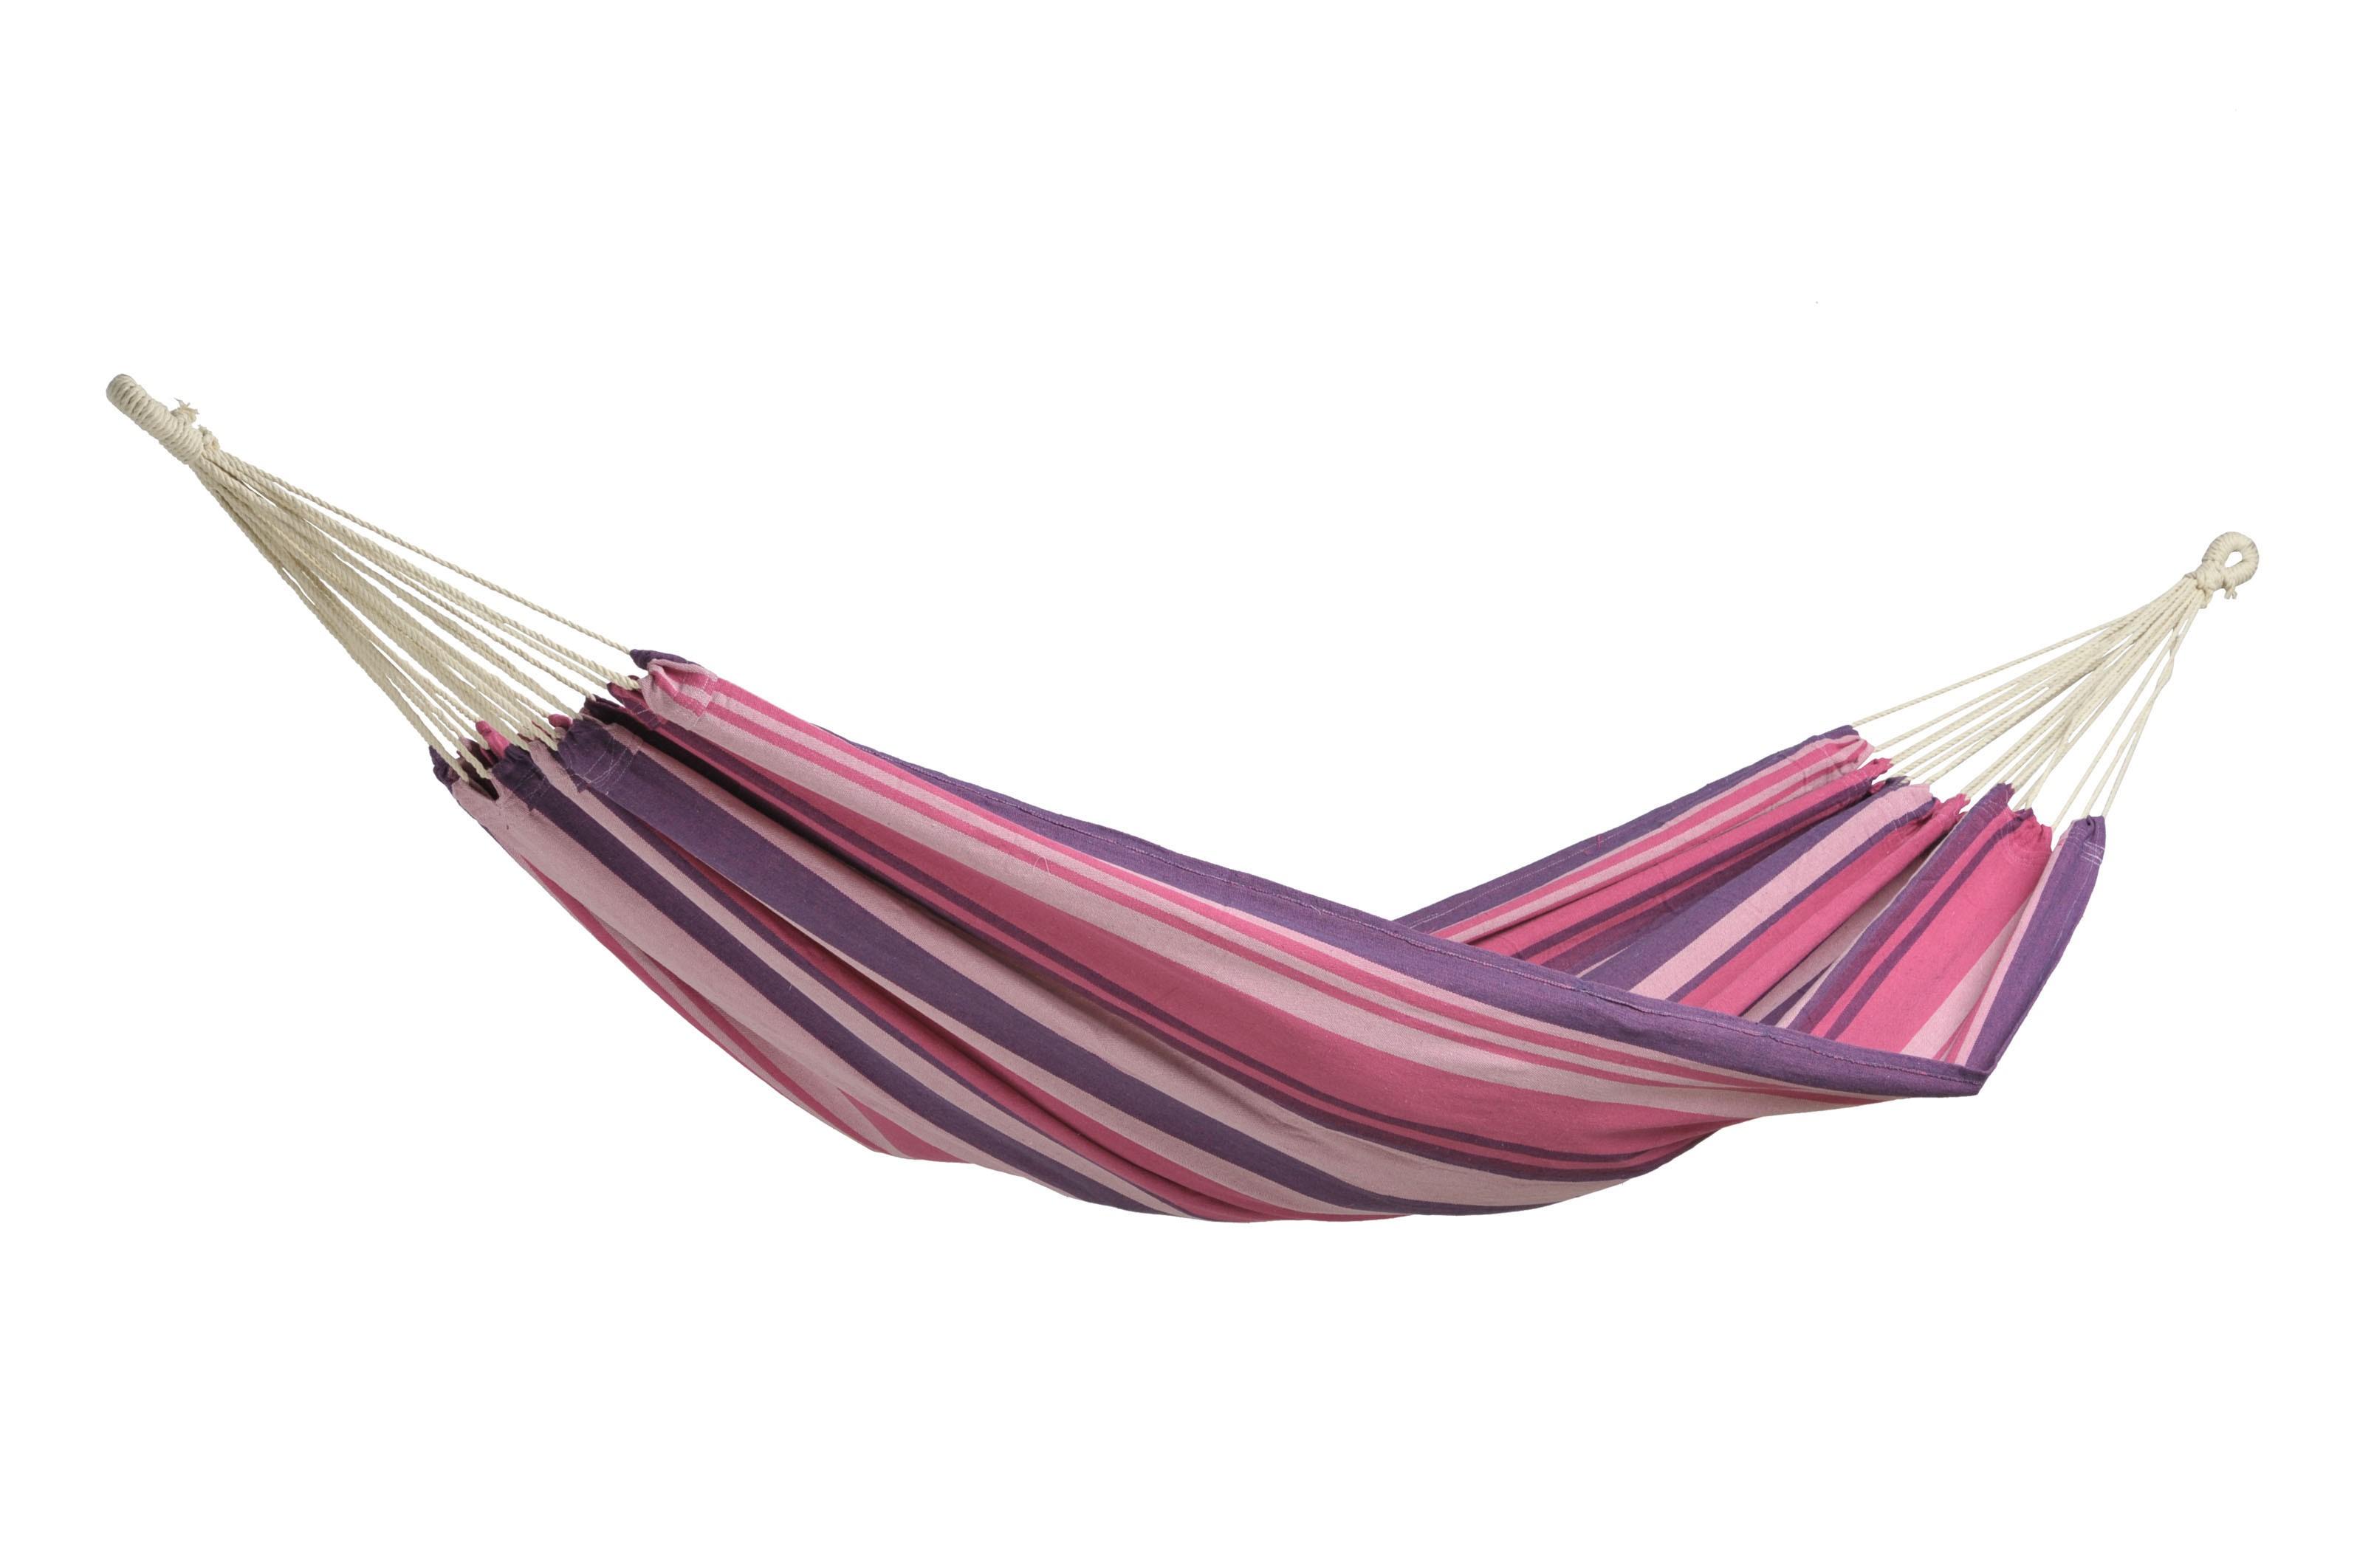 Hamac Jardin Violet Candy Xl Tahiti De Amazonas Rose 200x100cm HDIWE29